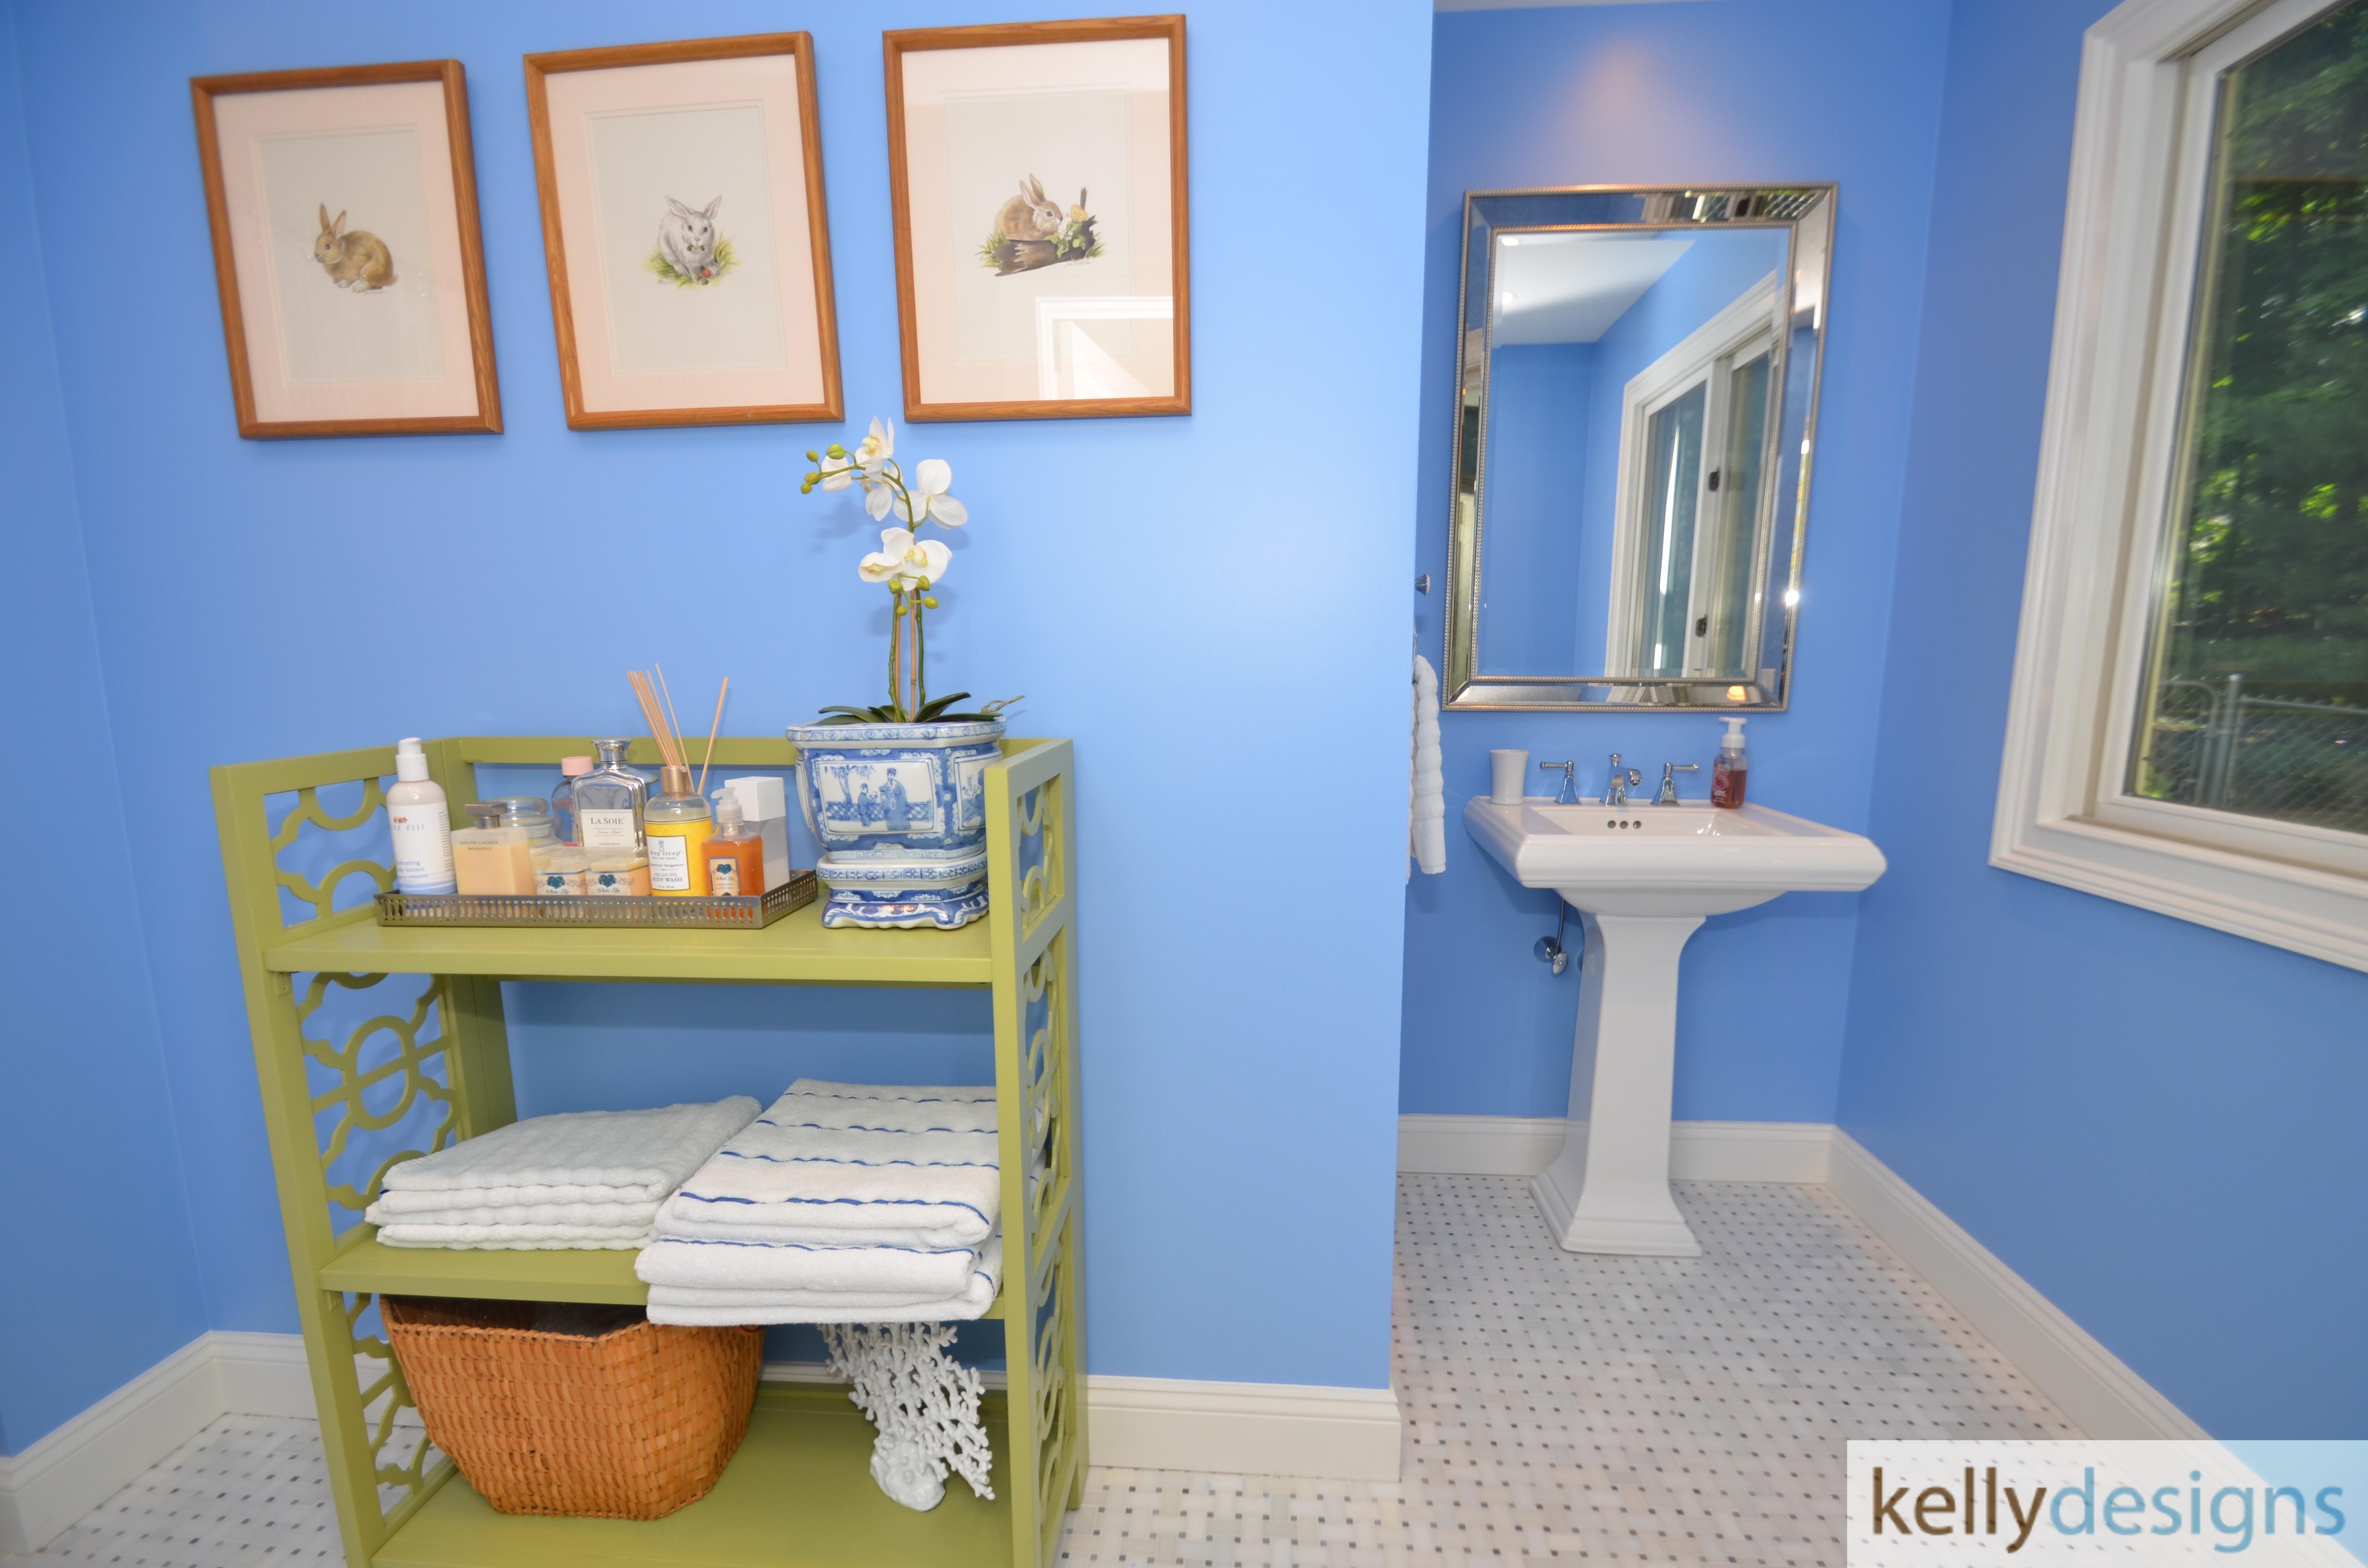 Preppy With A Purpose Bathroom Interior Design By Kellydesigns